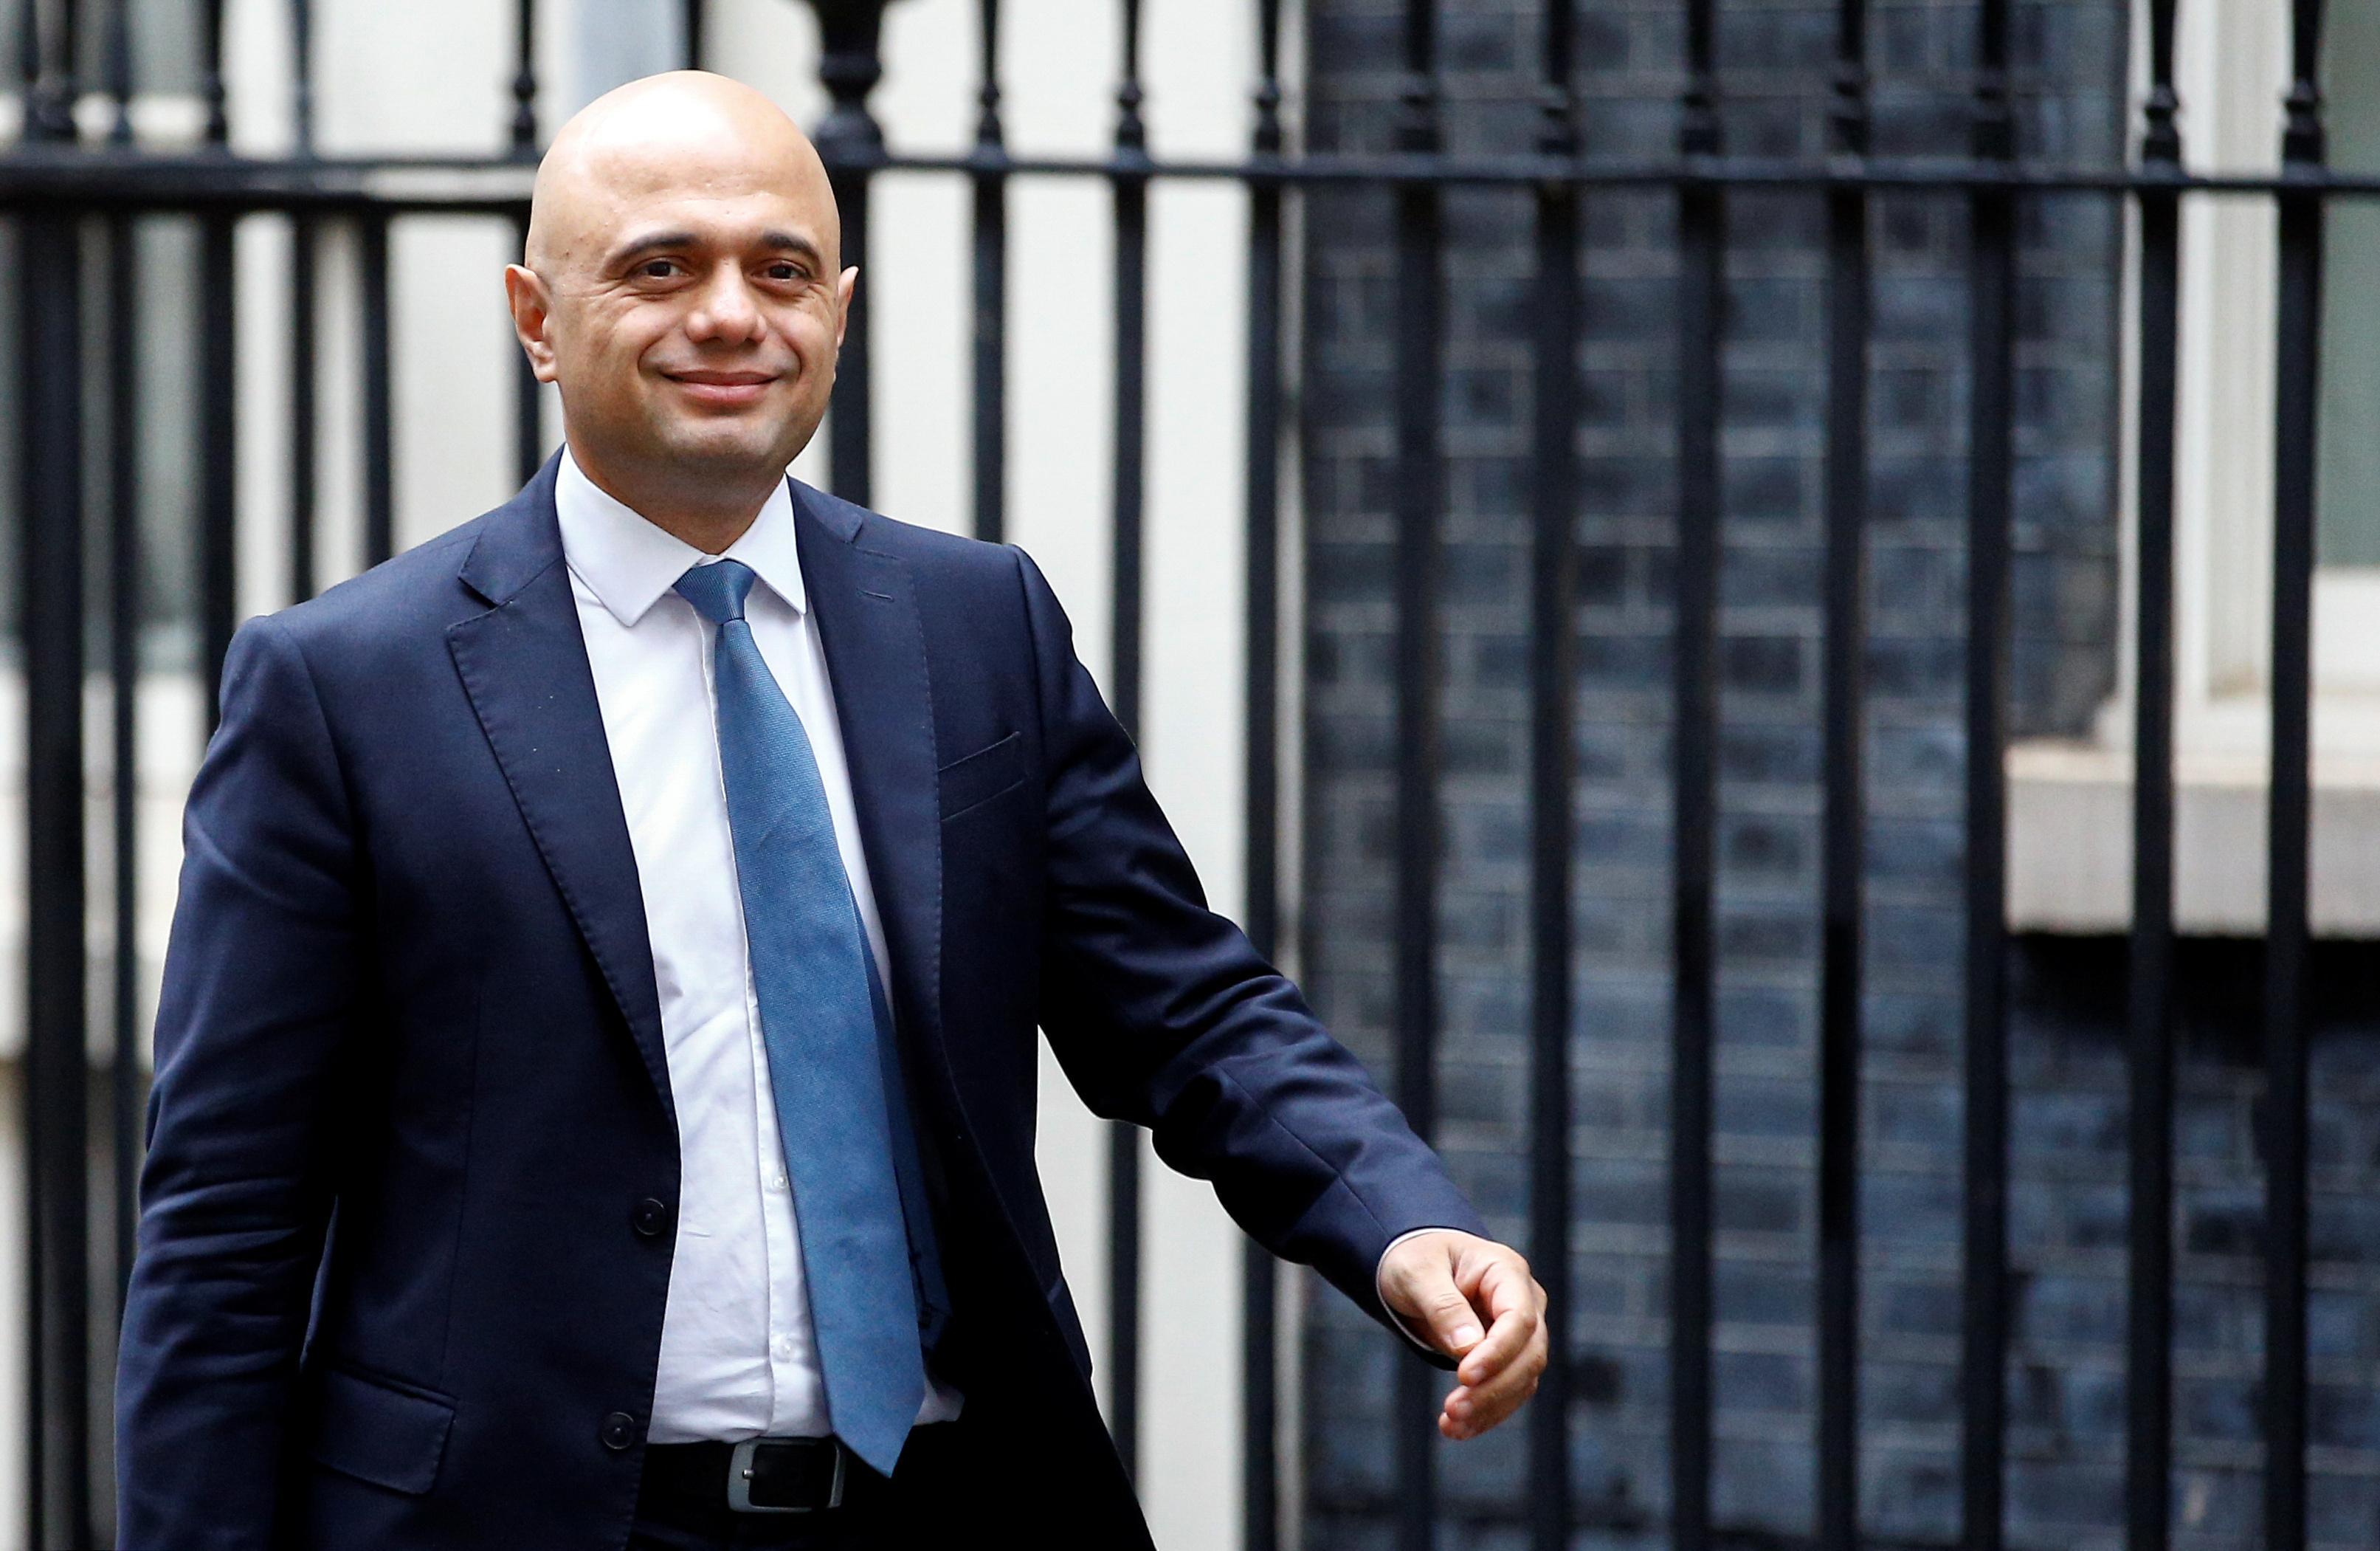 UK Brexit plan has 'decent chance' in key vote on Saturday: Javid